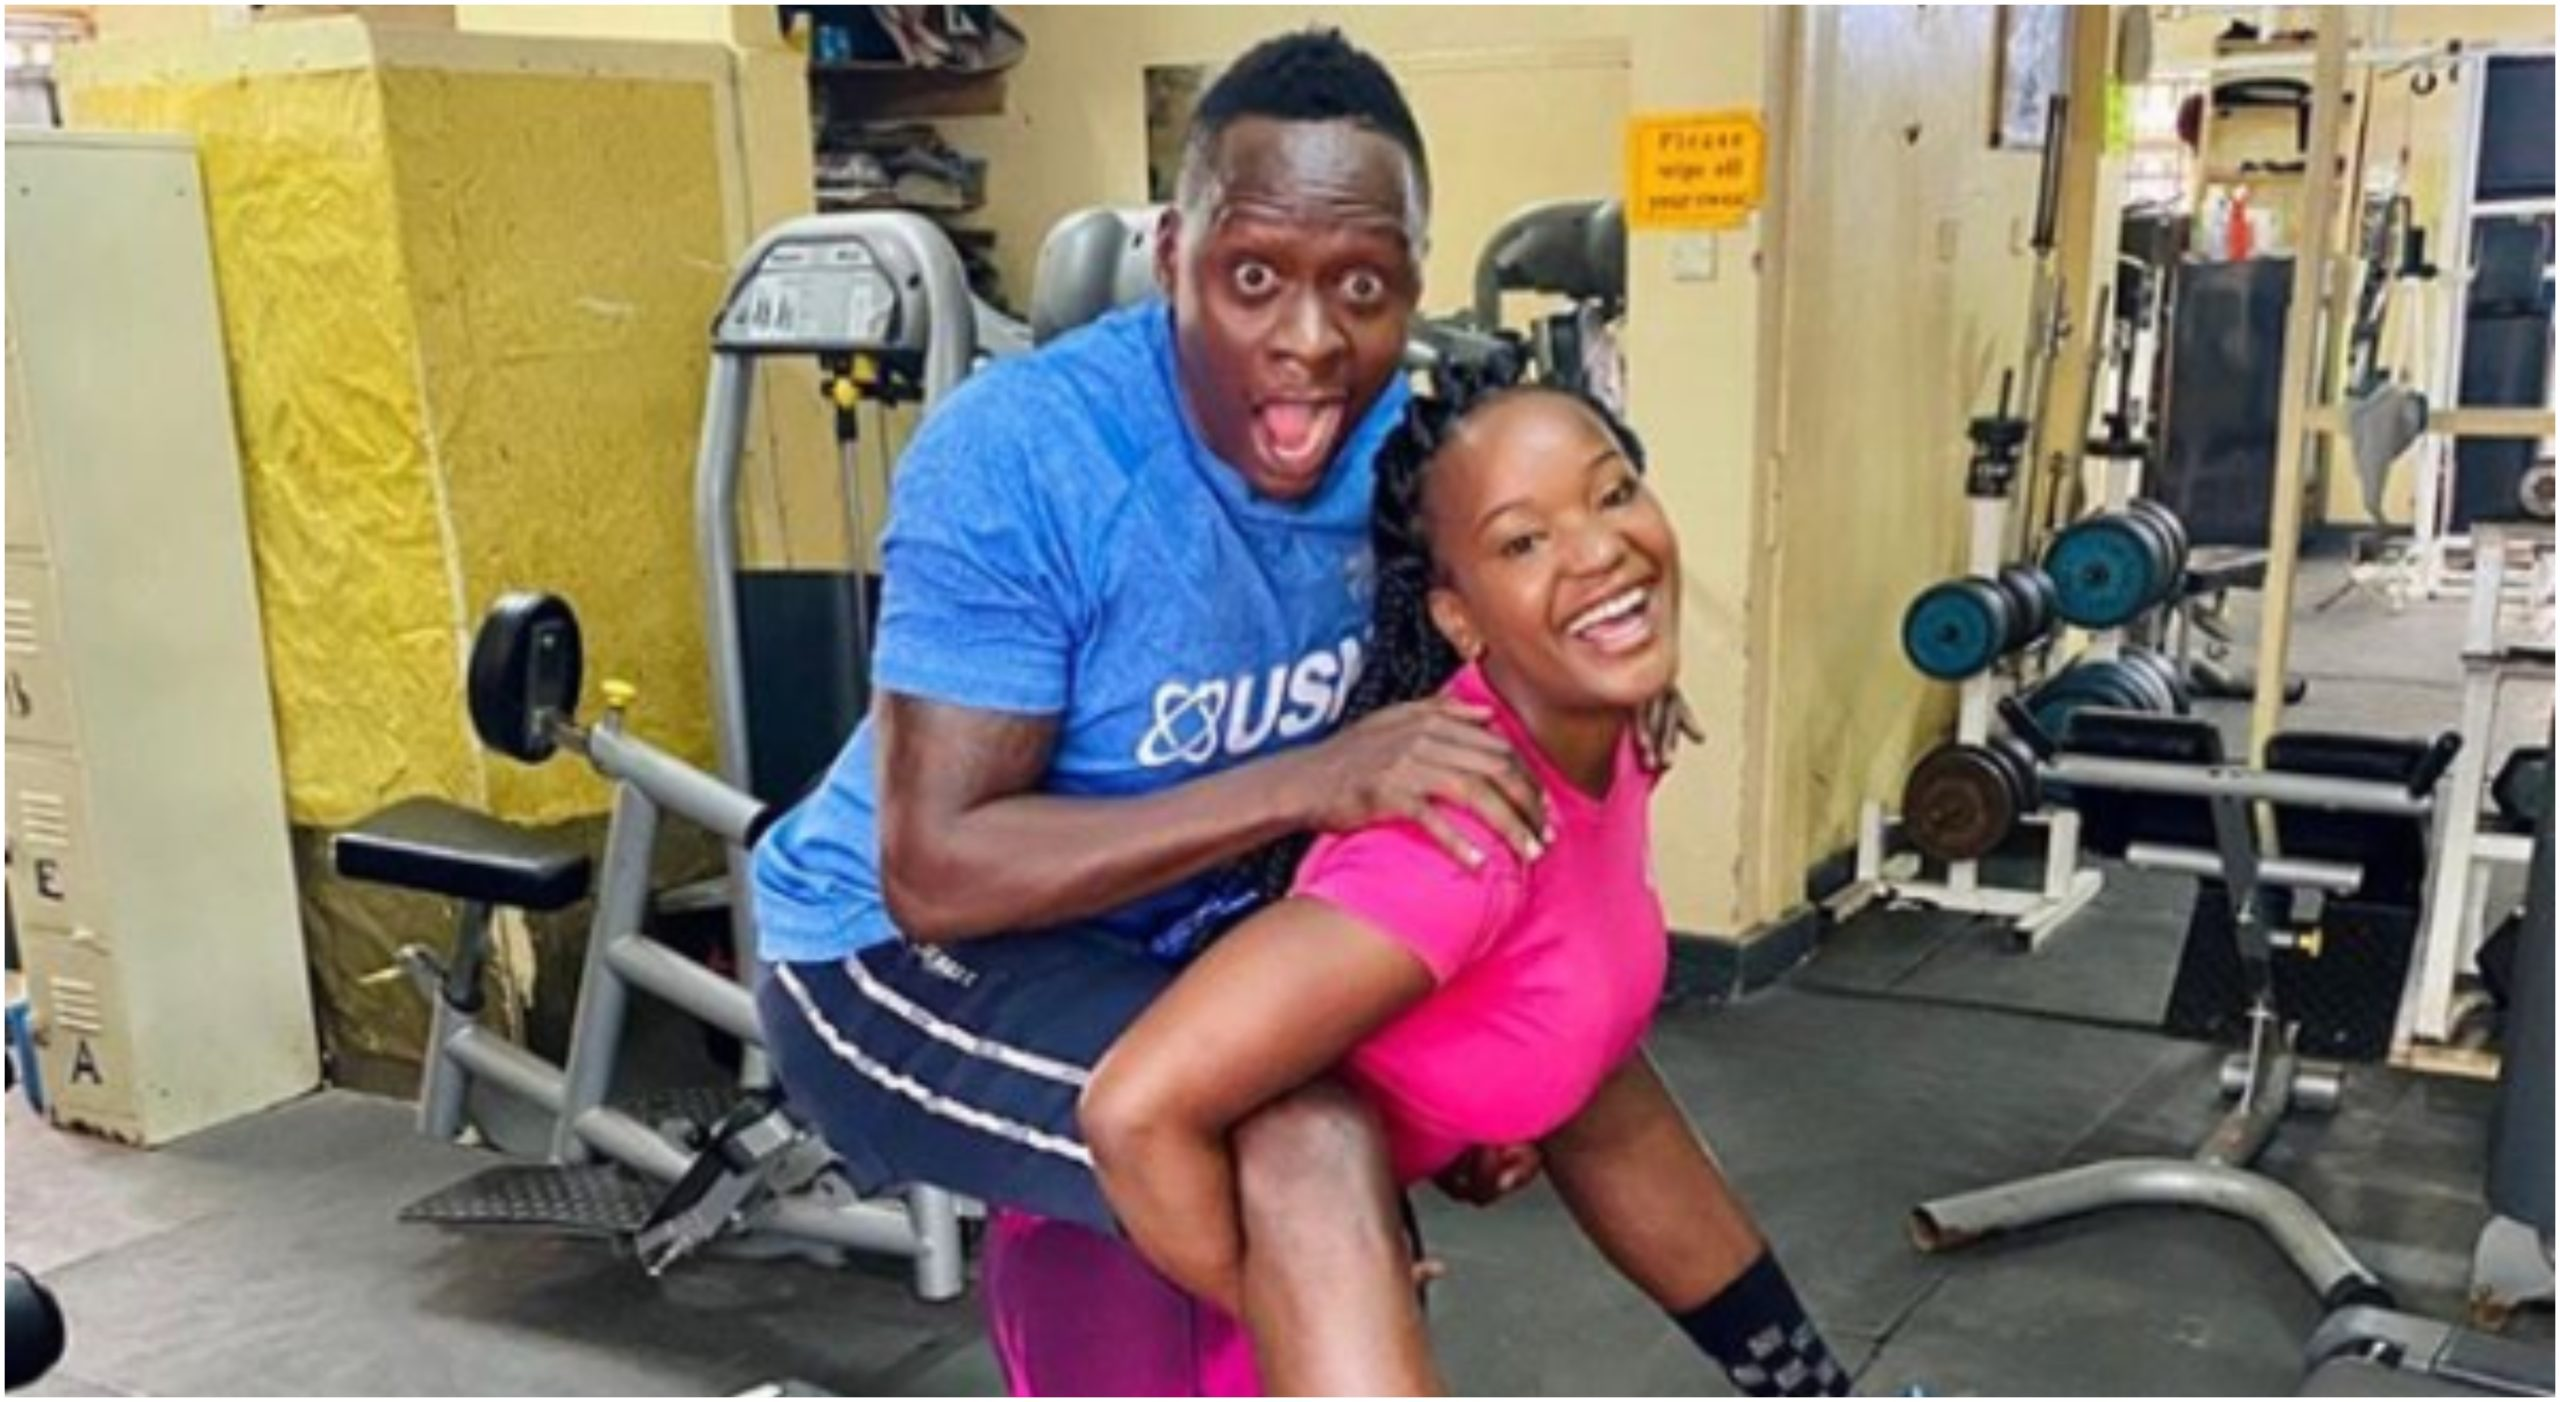 Oga Obinna cheating on wife with city socialite Sherlyne Anyango? (Photos)